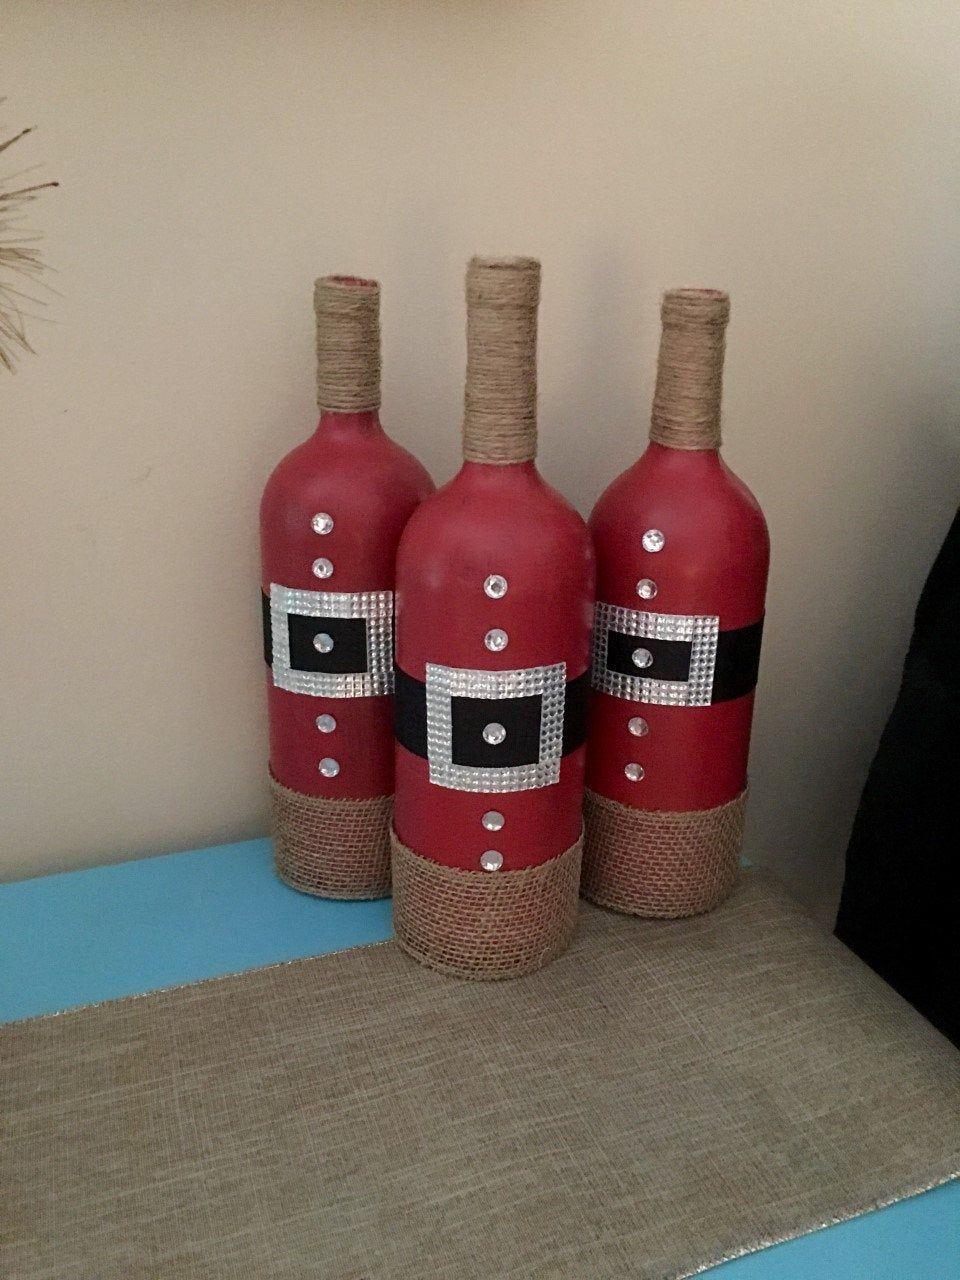 Christmas Wine Bottles Christmas Home Decor Santa Home Etsy Christmas Wine Bottles Bottles Decoration Wine Bottle Christmas Decorations